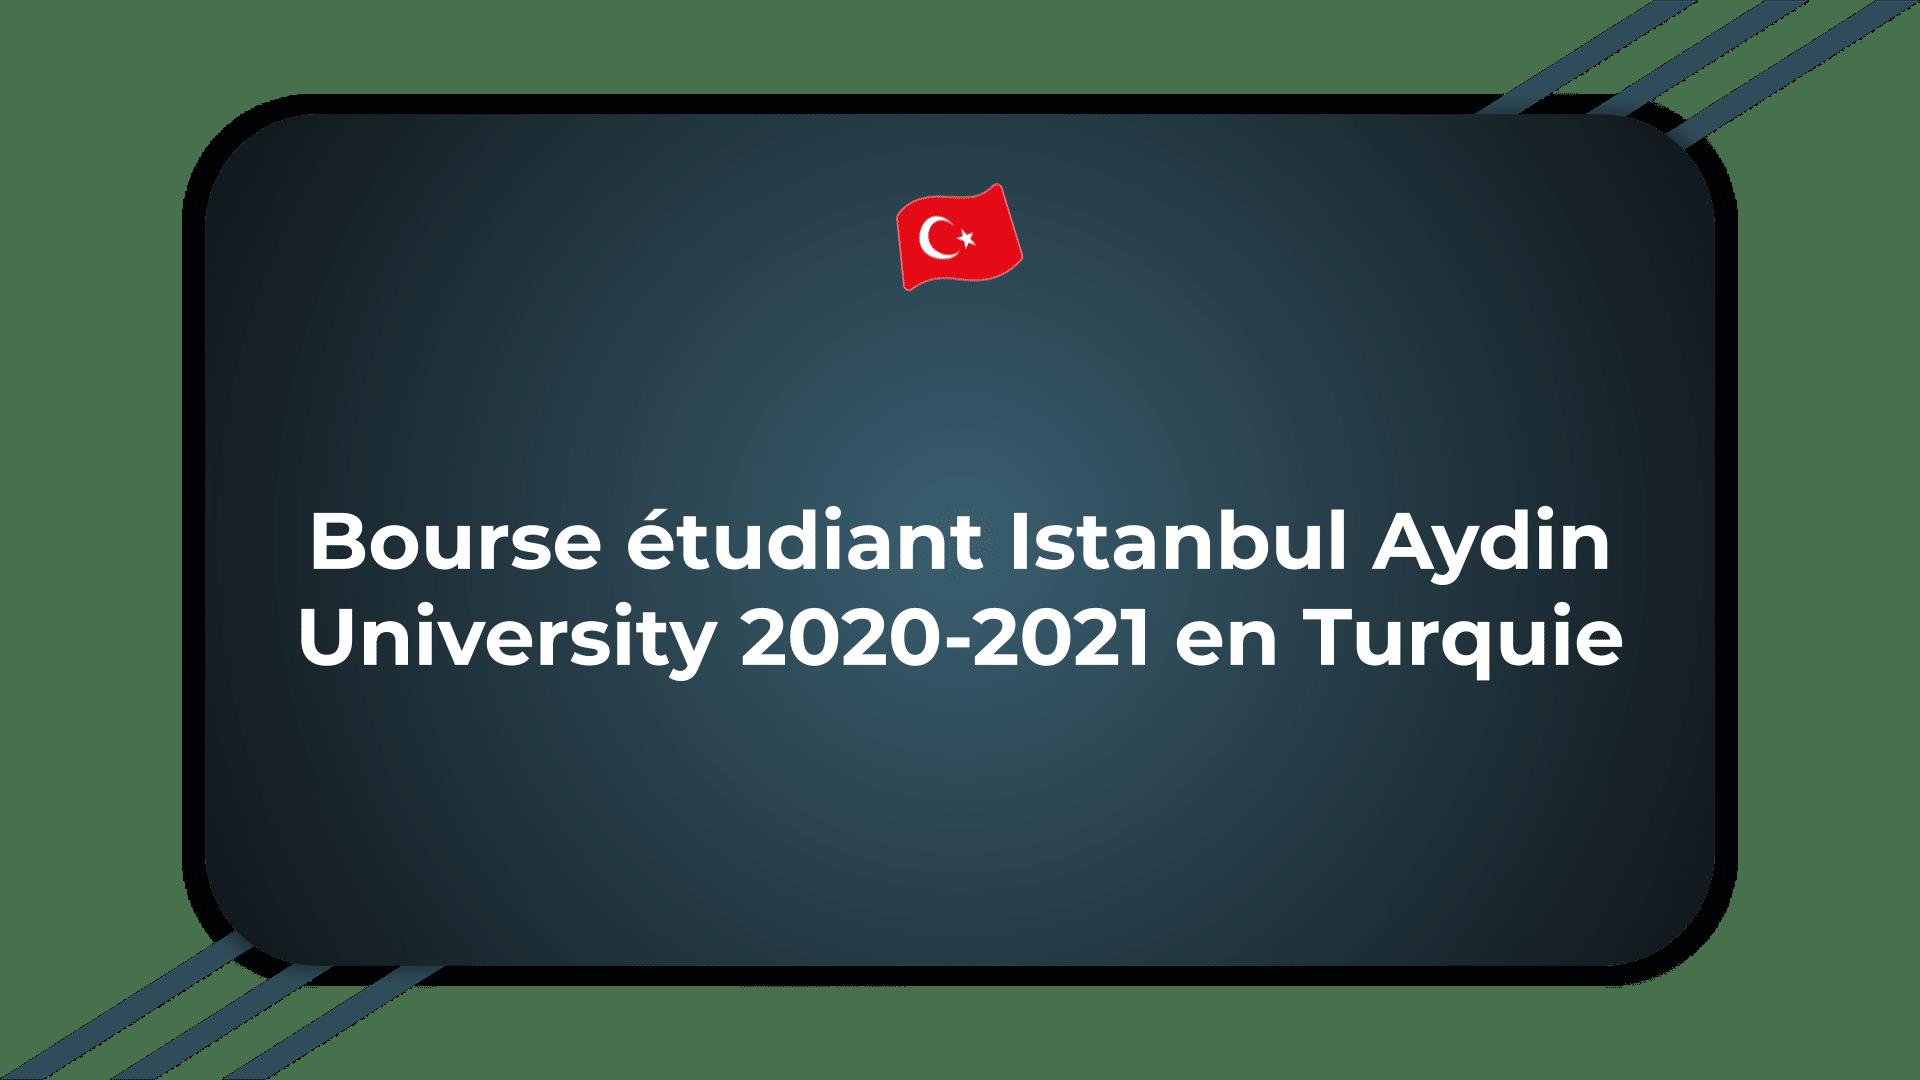 Bourse étudiant Istanbul Aydin University